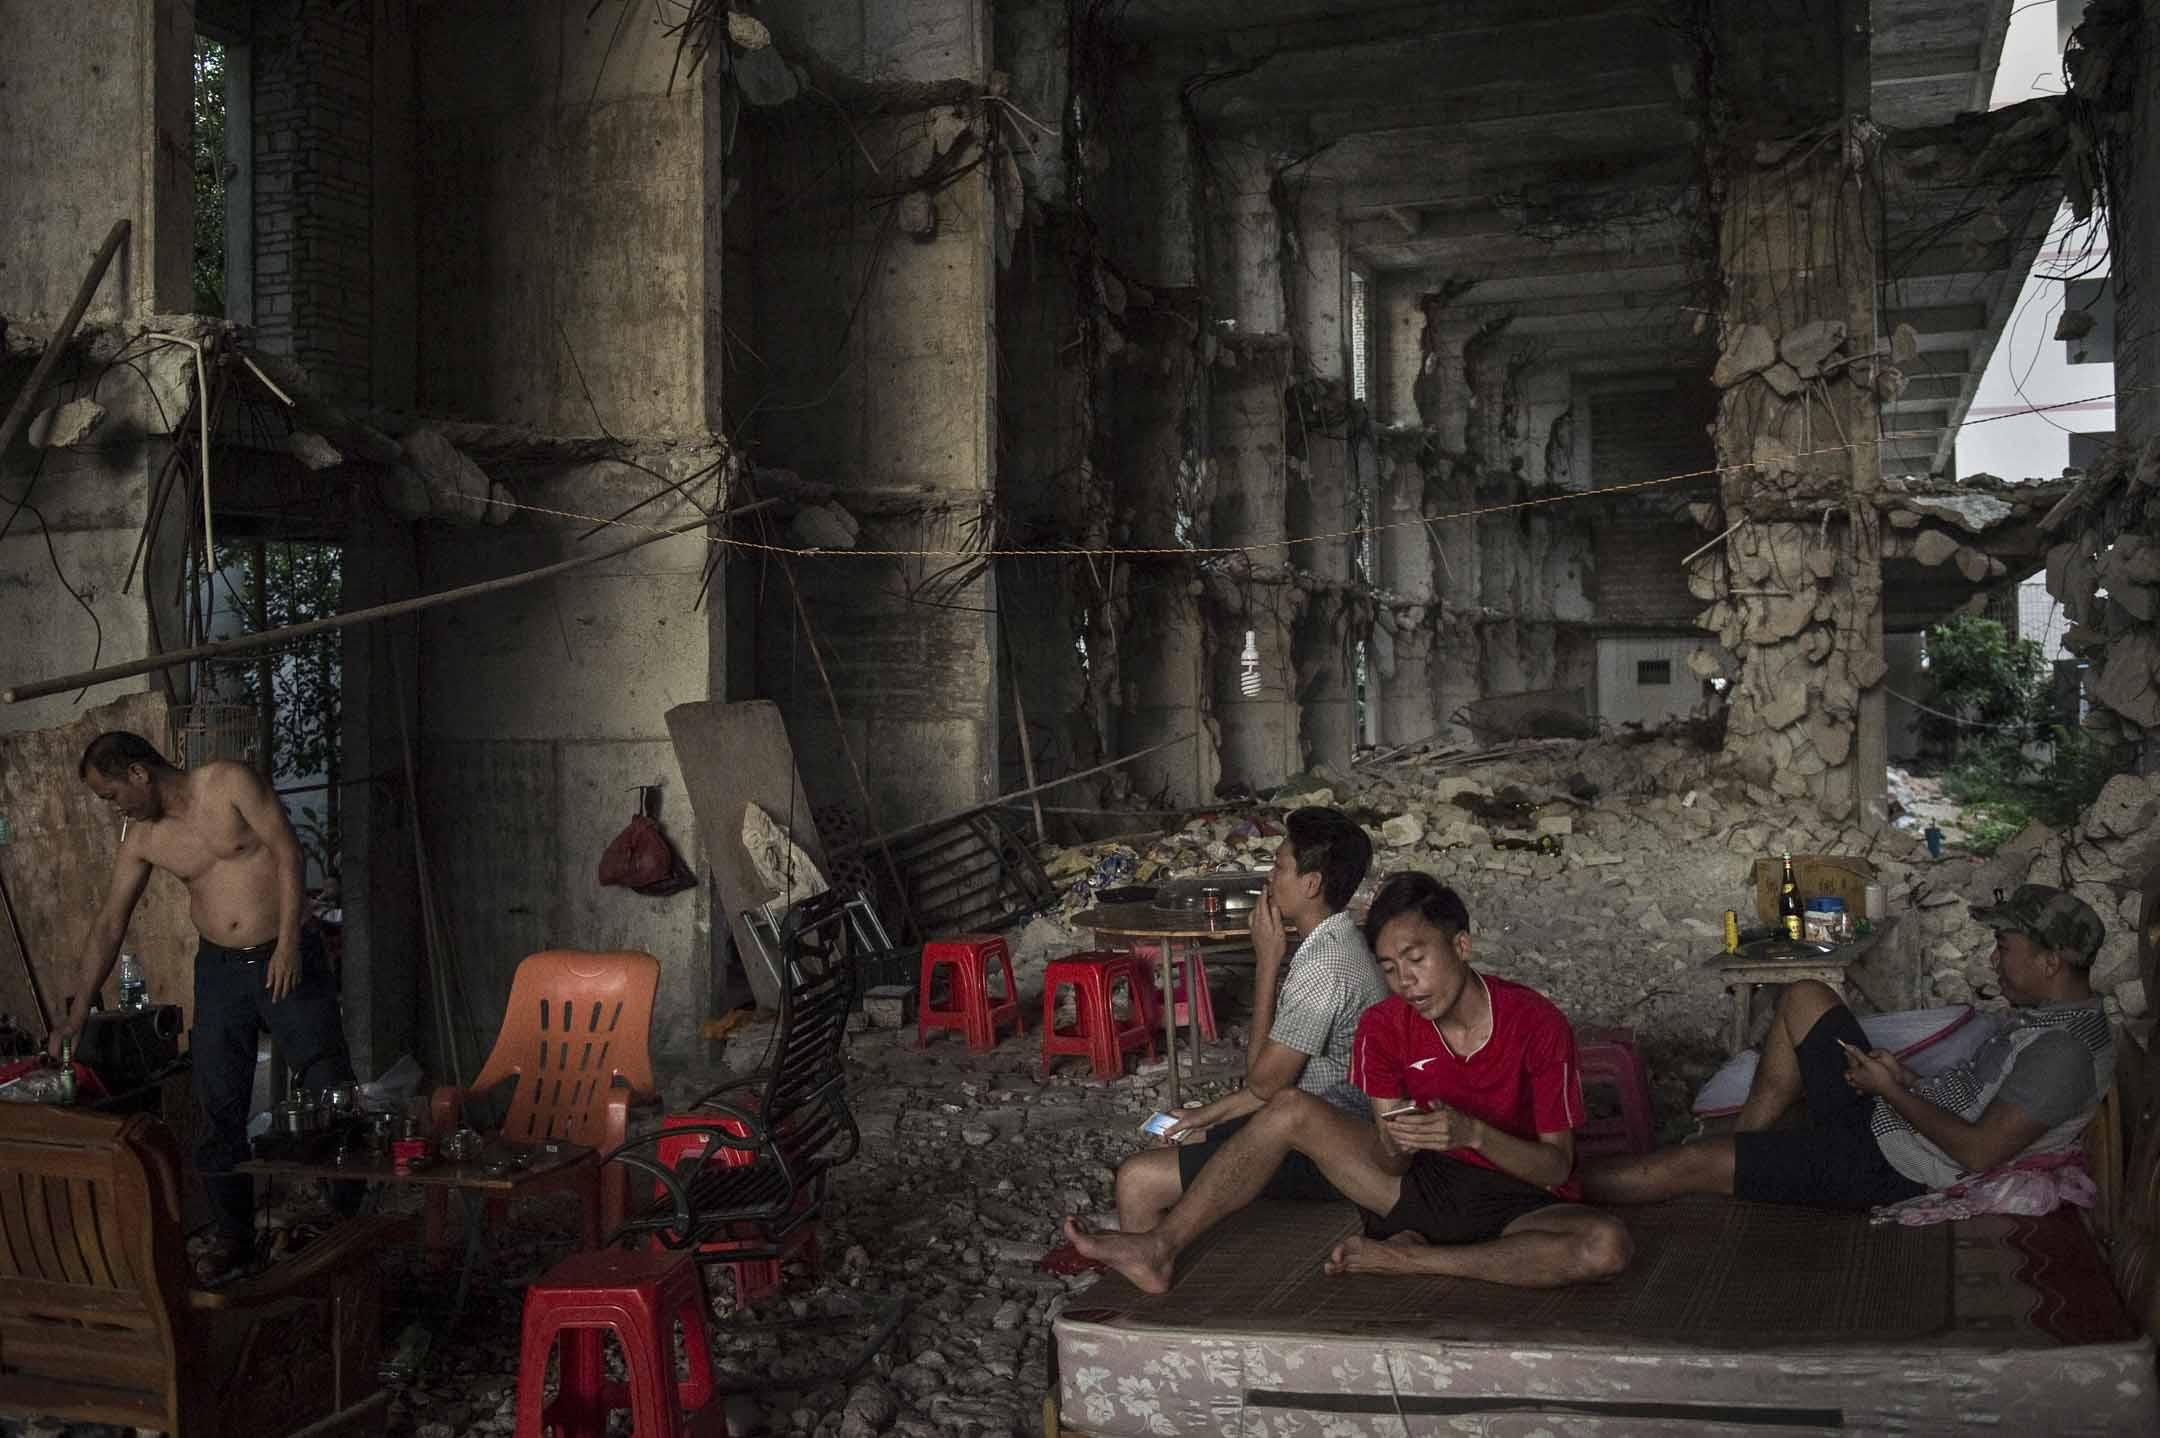 2016年10月12日,人們蹲在拆卸中的一個三亞建築物中。 攝:Nicolas Asfouri/AFP via Getty Images